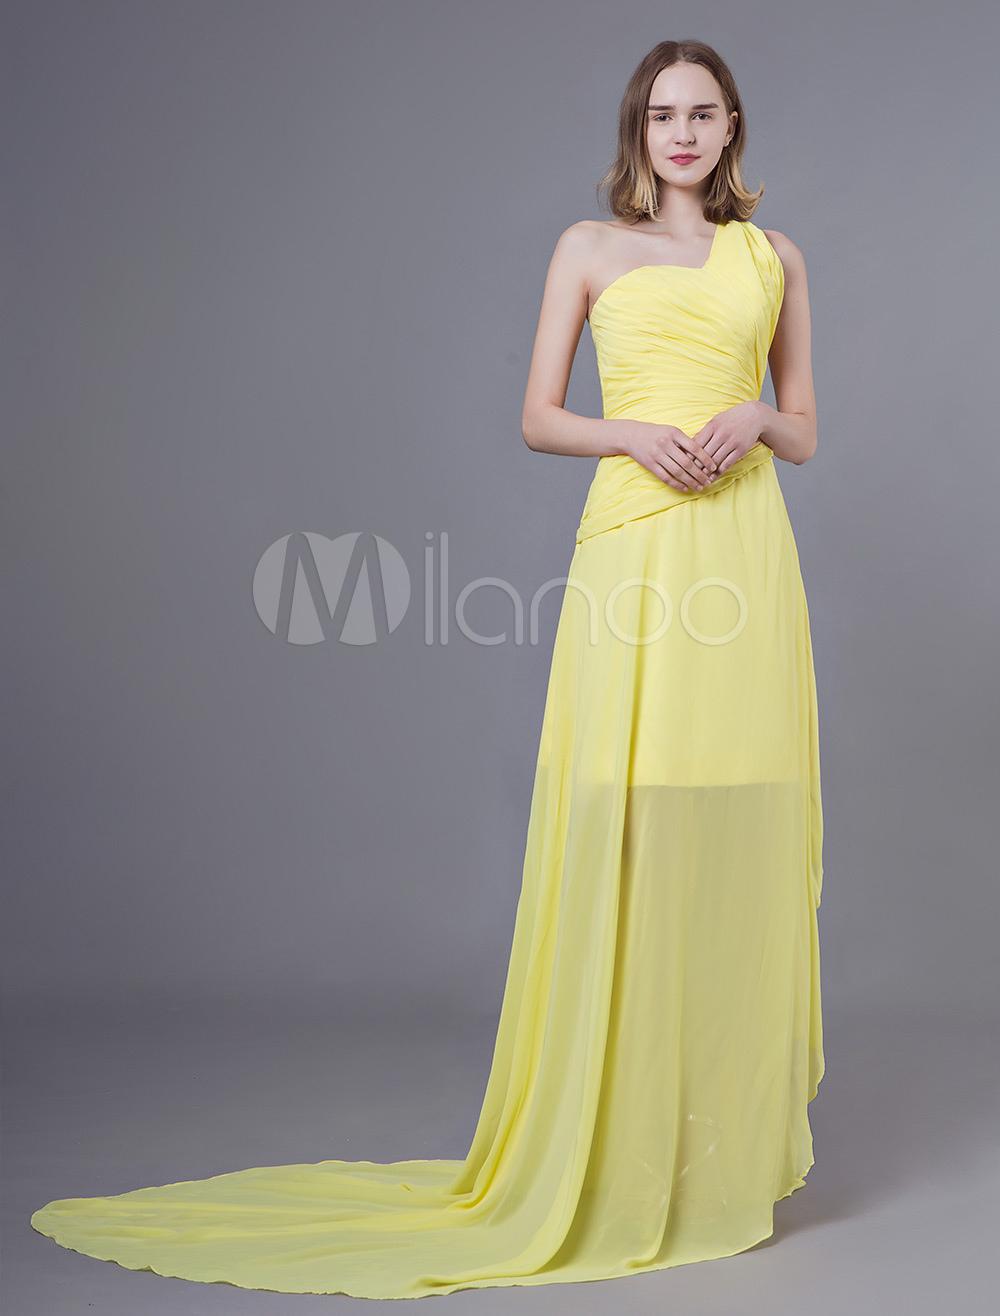 0e7425e9401 Prom Dresses Long Chiffon Daffodil One Shoulder Asymmetrical Bridesmaid  Dress-No.1 ...